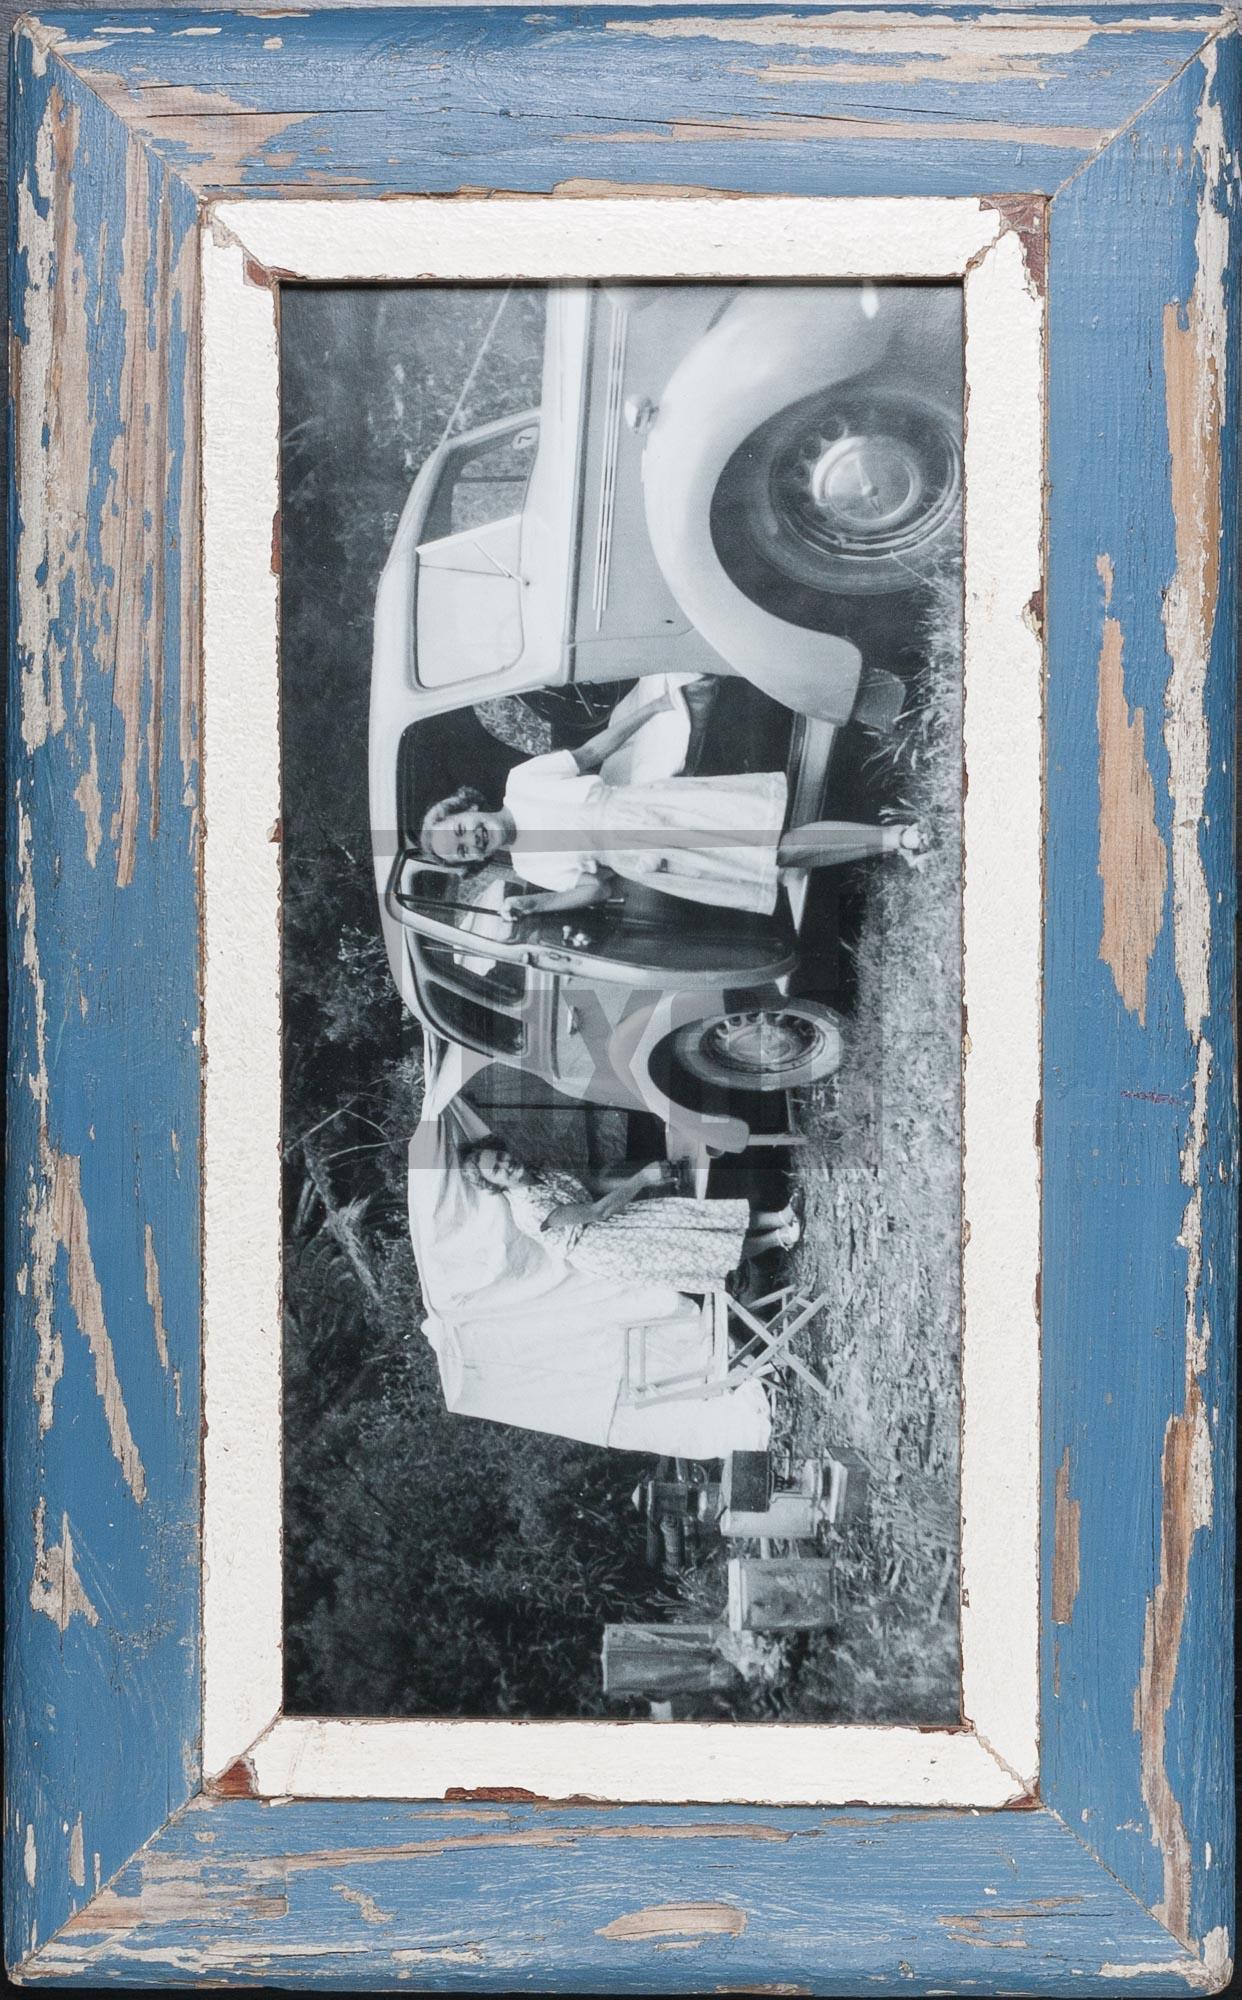 Blauer Panorama-Bilderrahmen für Fotos ca. 21 x 42 cm